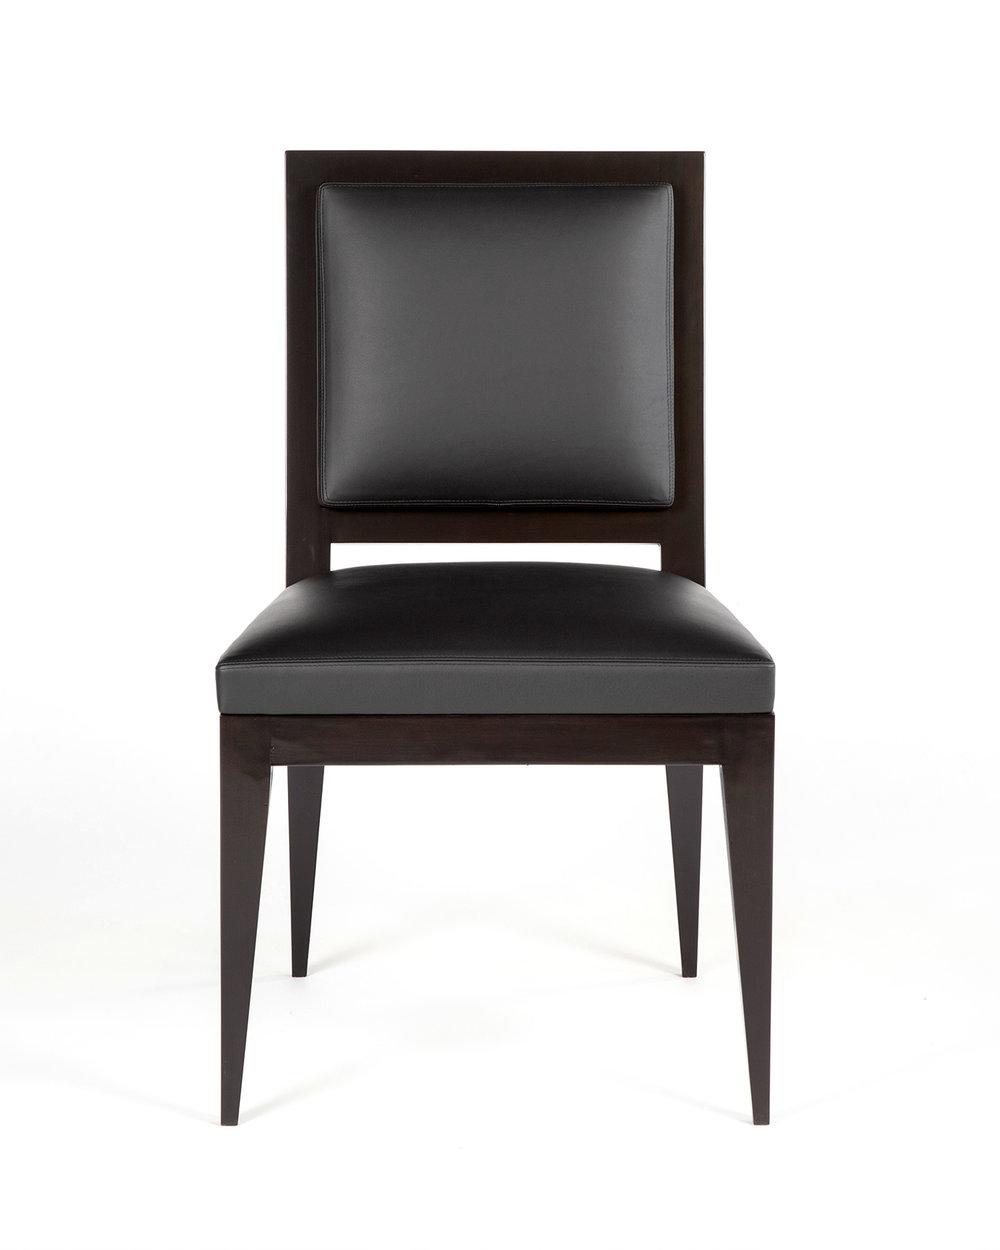 Carre_Side_Chair_002.jpg